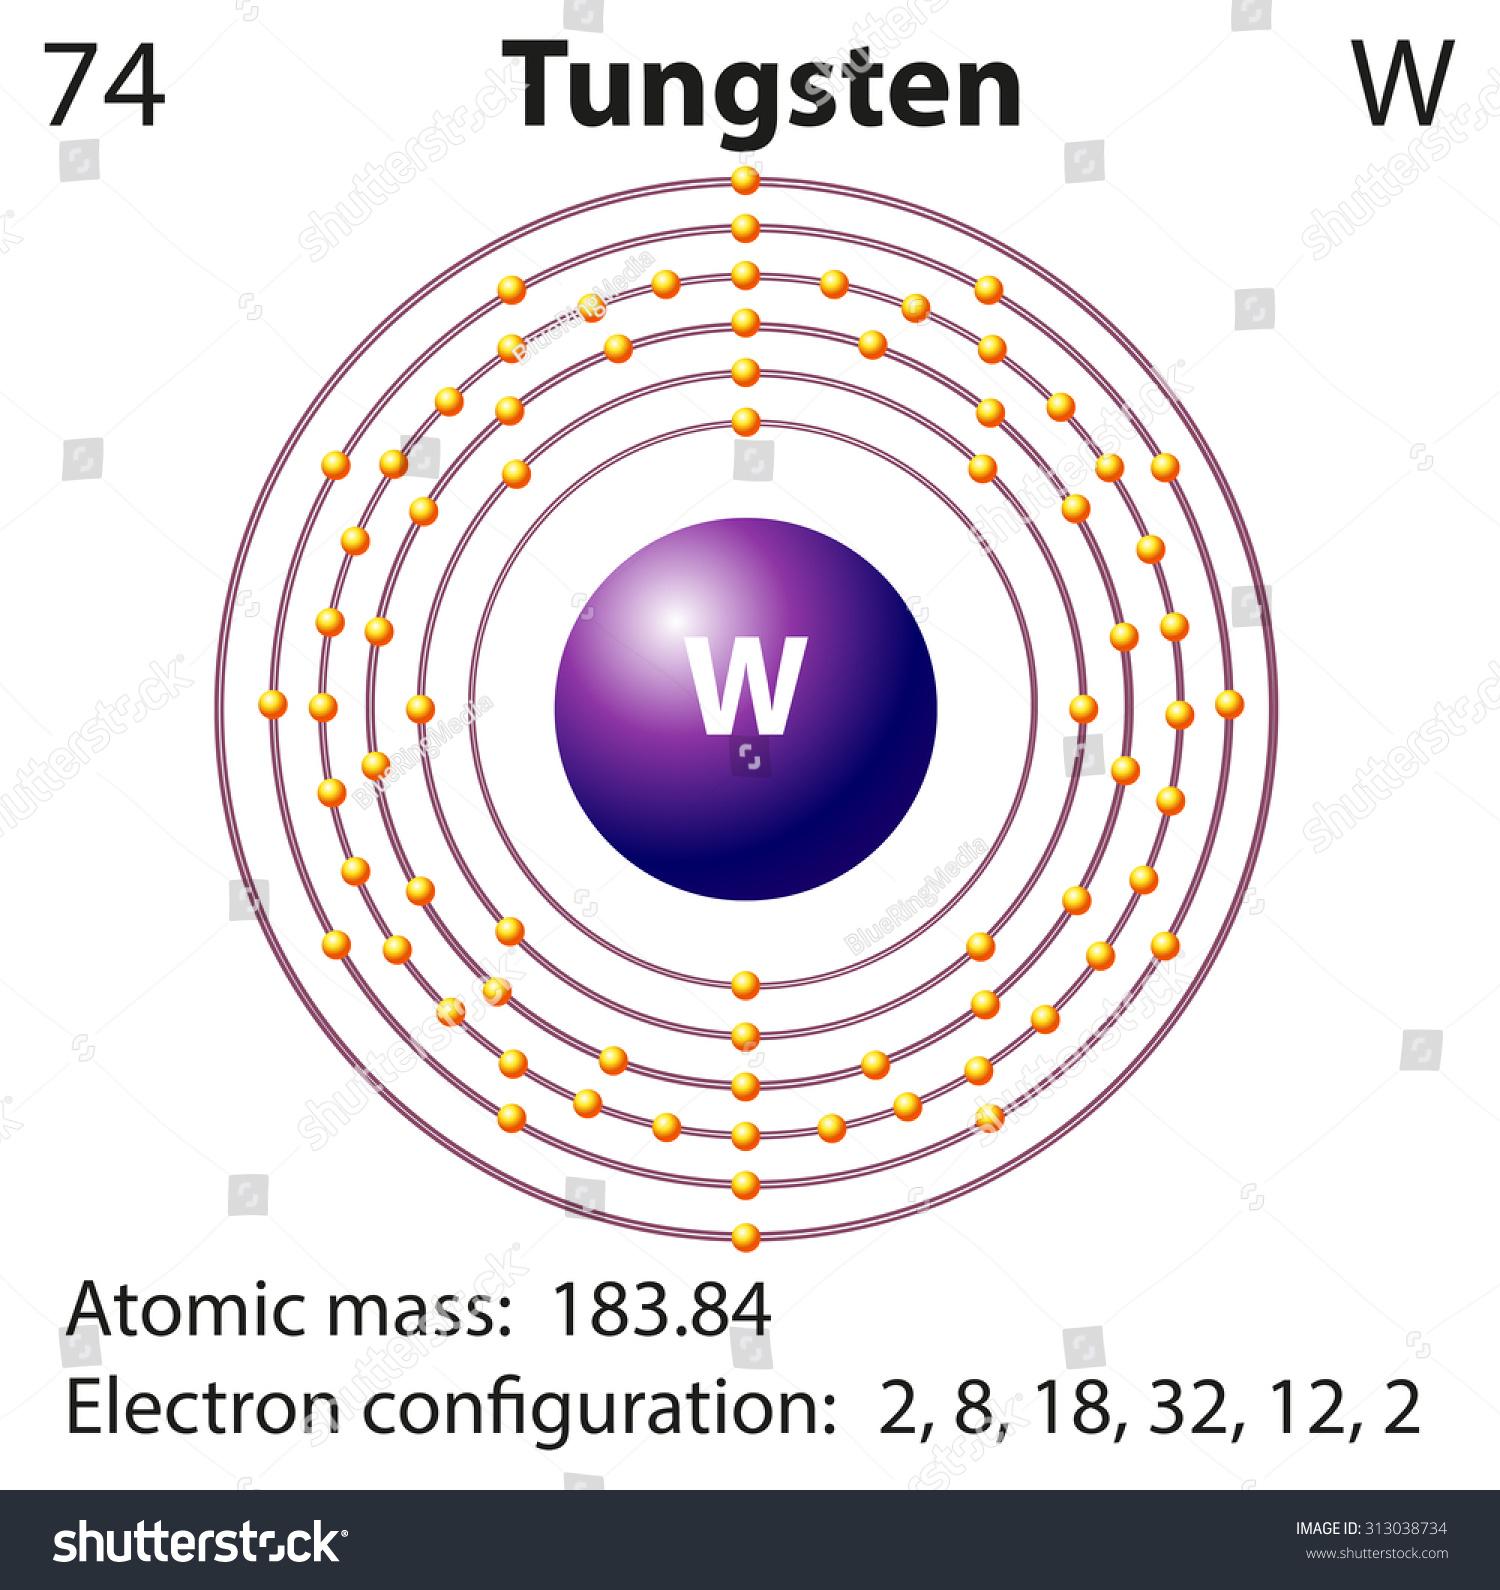 Tungsten Electron Shell Diagram Custom Wiring Bohr For Oxygen Shells Configuration Chemistry Representation Element Illustration Stock Vector Rh Shutterstock Com Atom Pattern Electrons